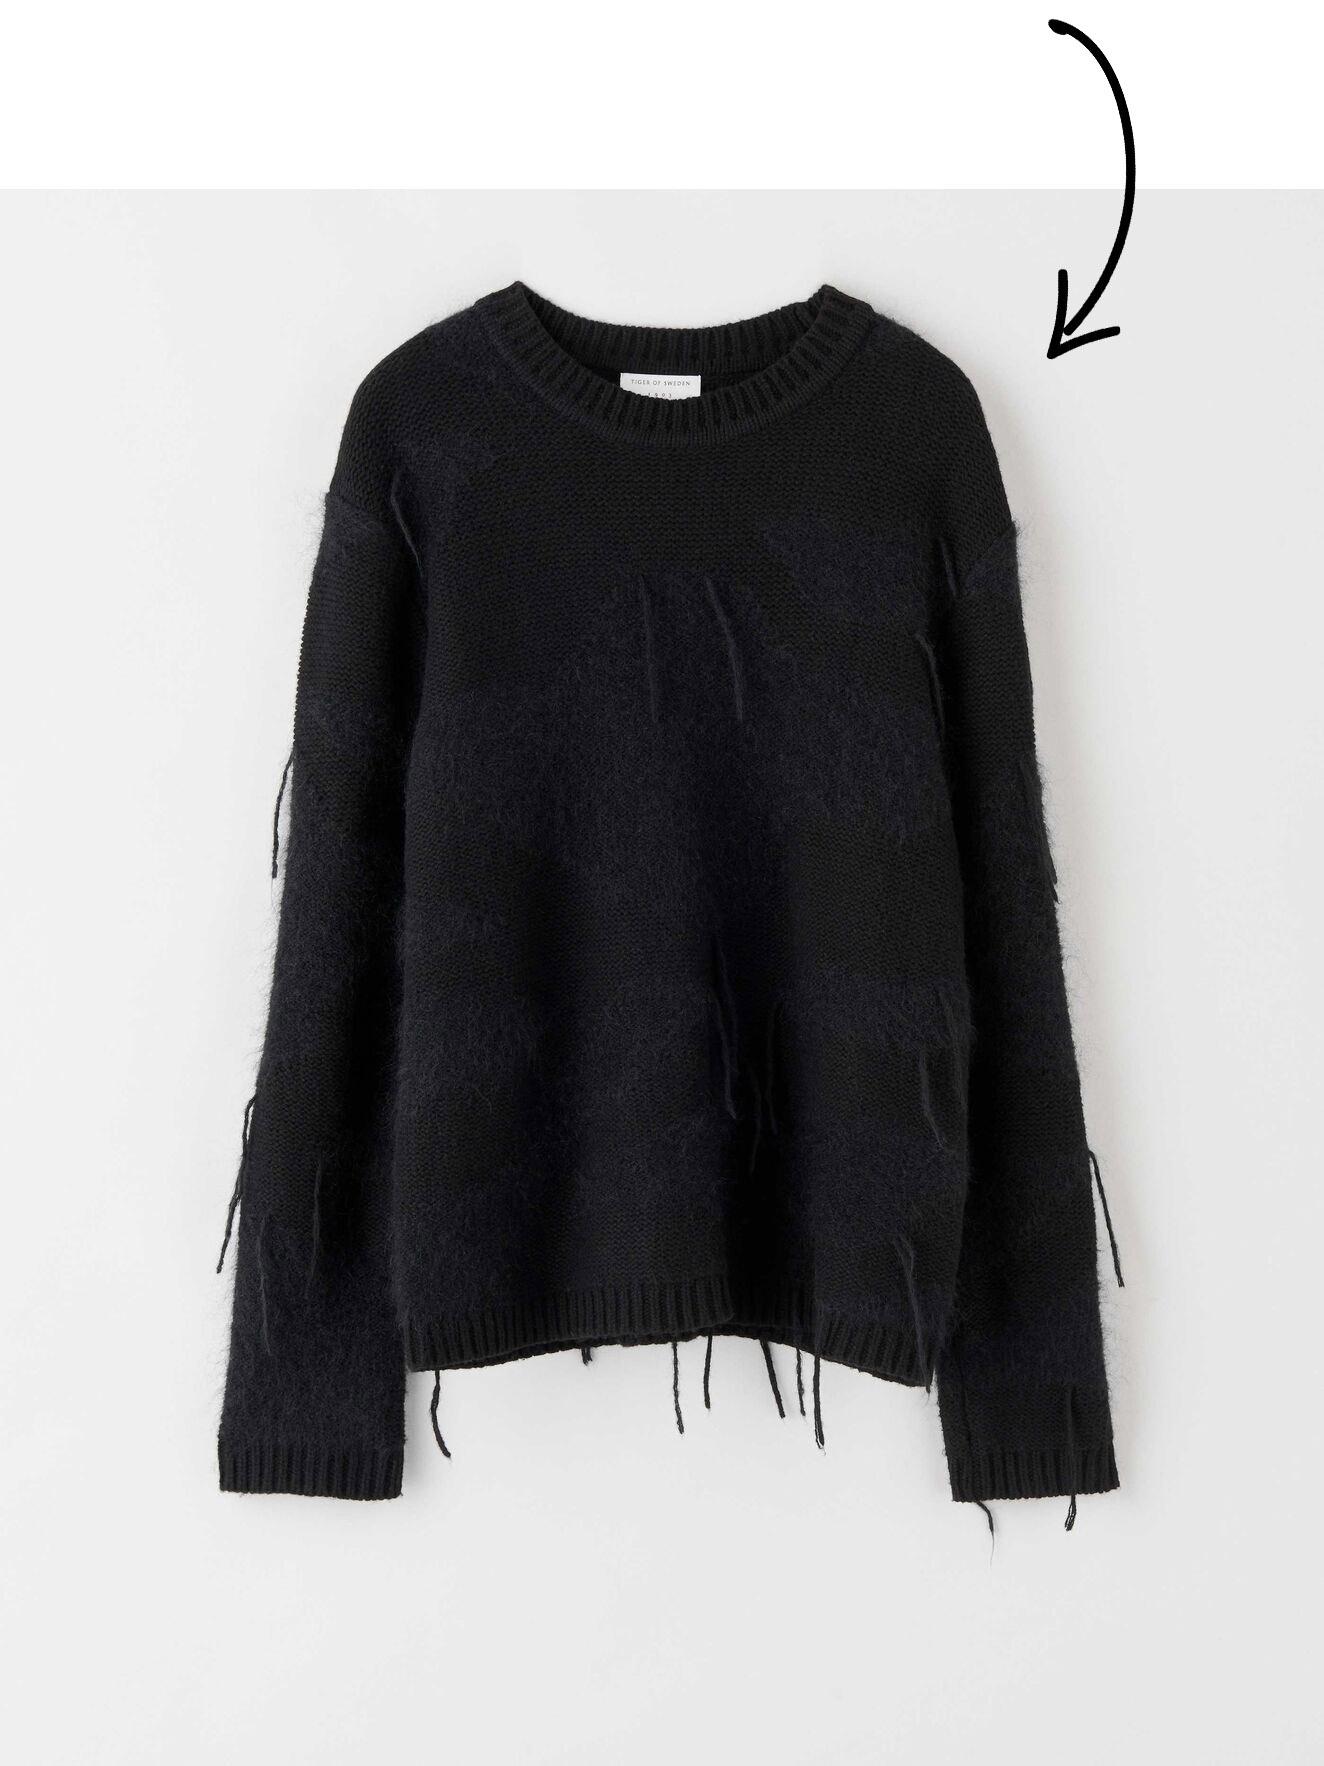 knitwear-trend-strickpullover-fuer-maenner